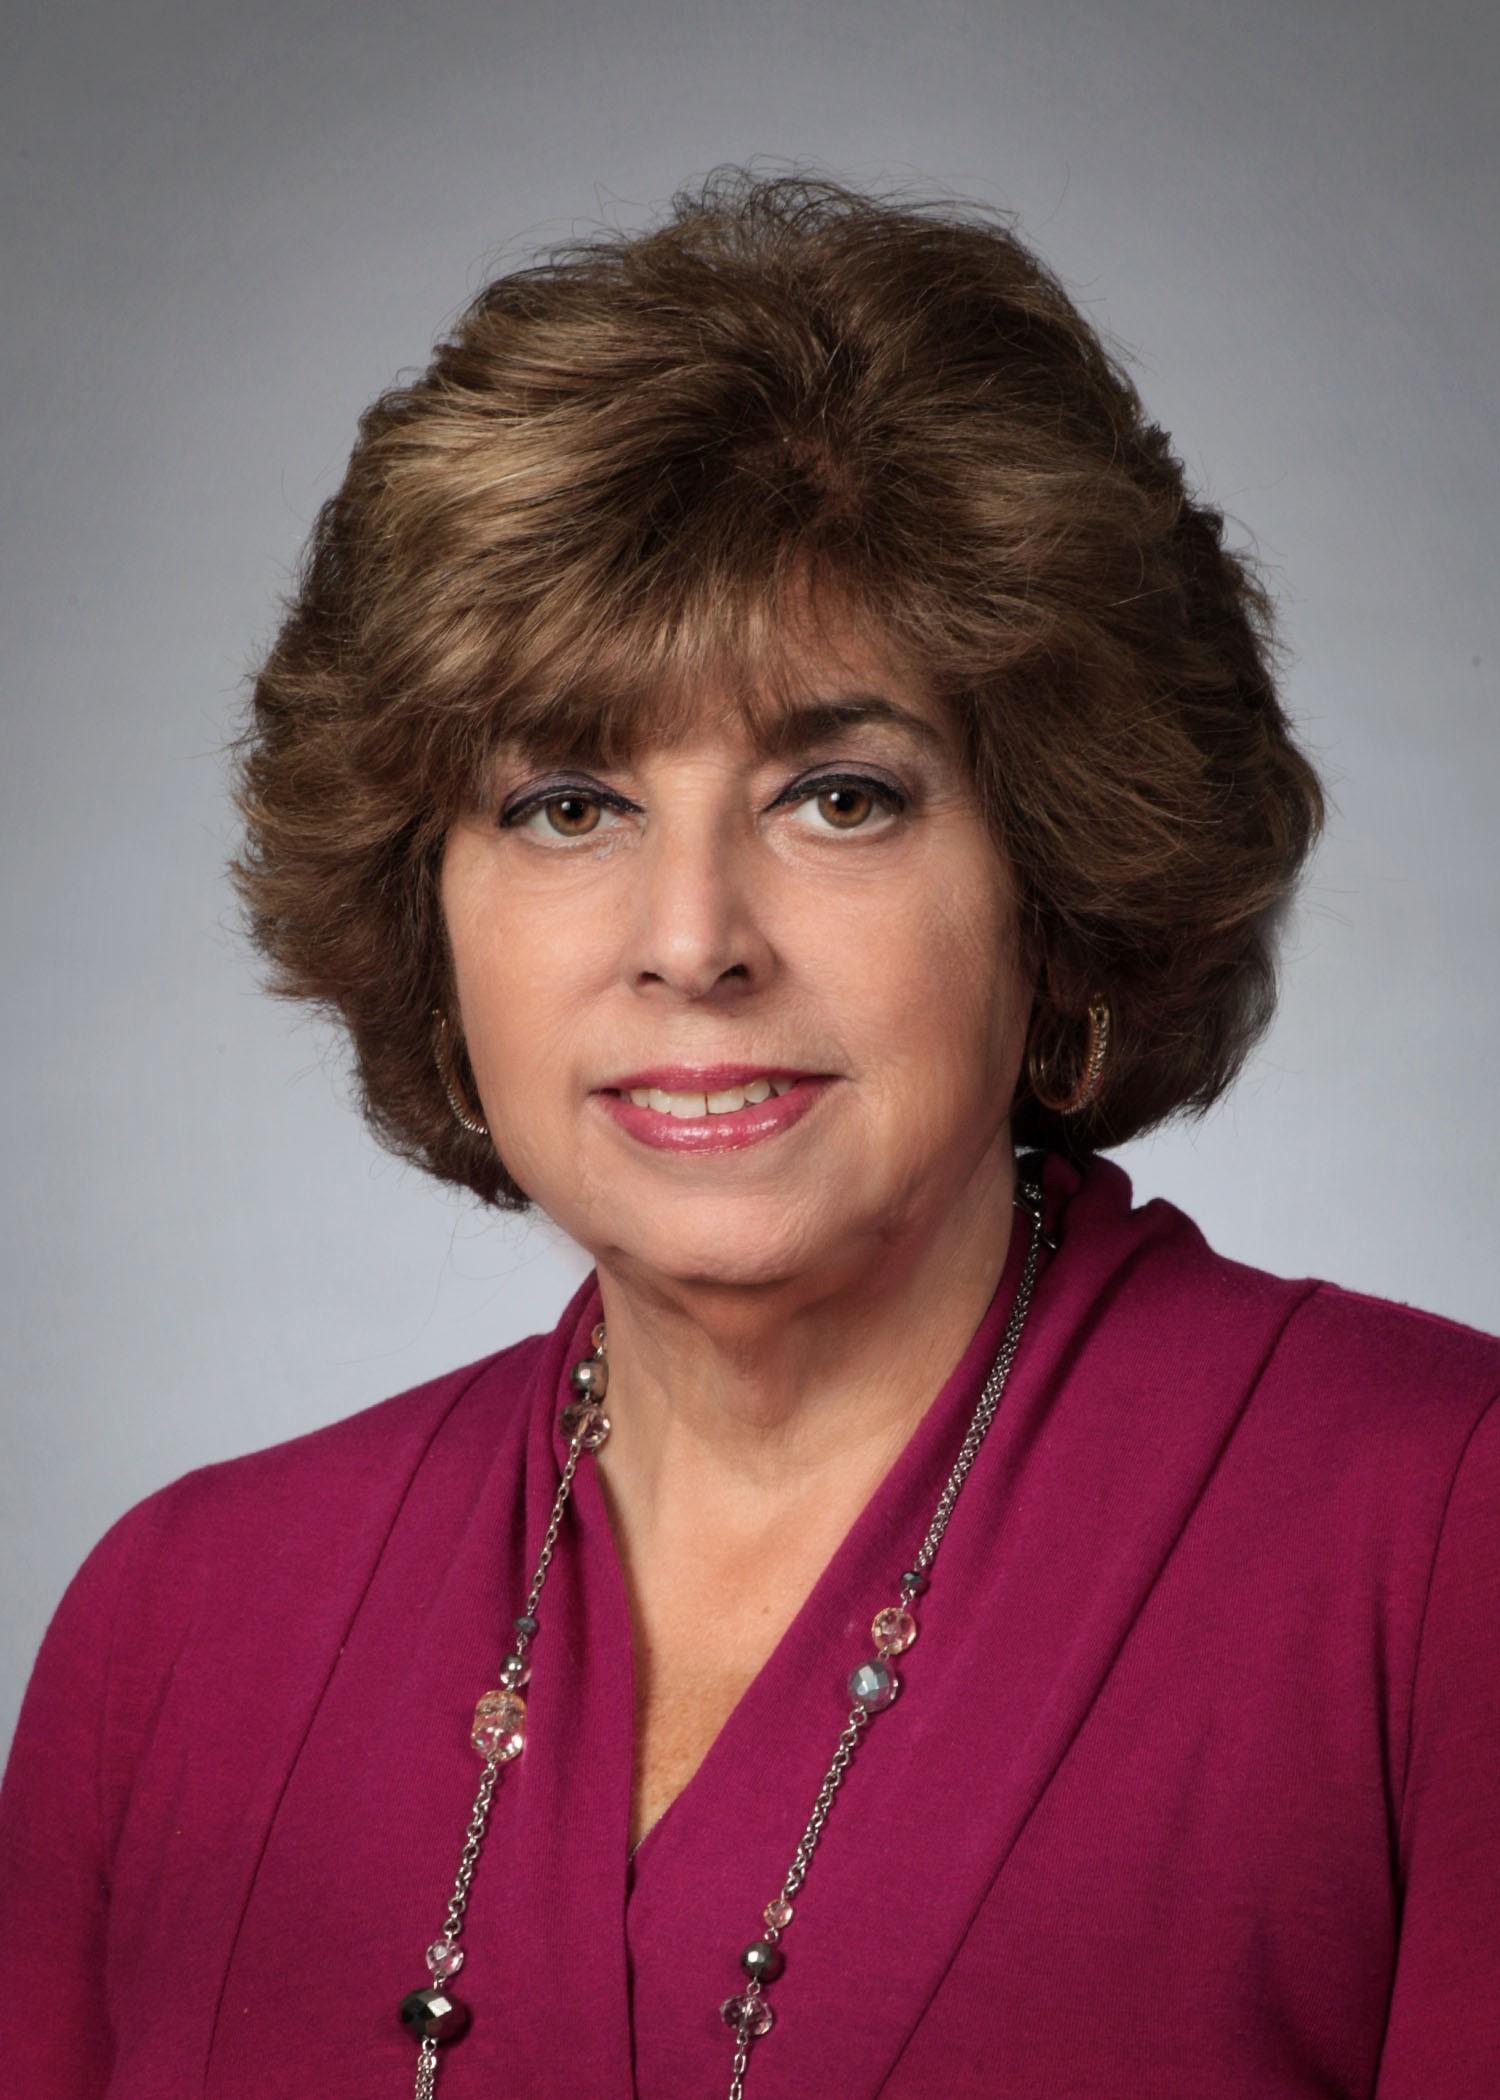 Marlene Price